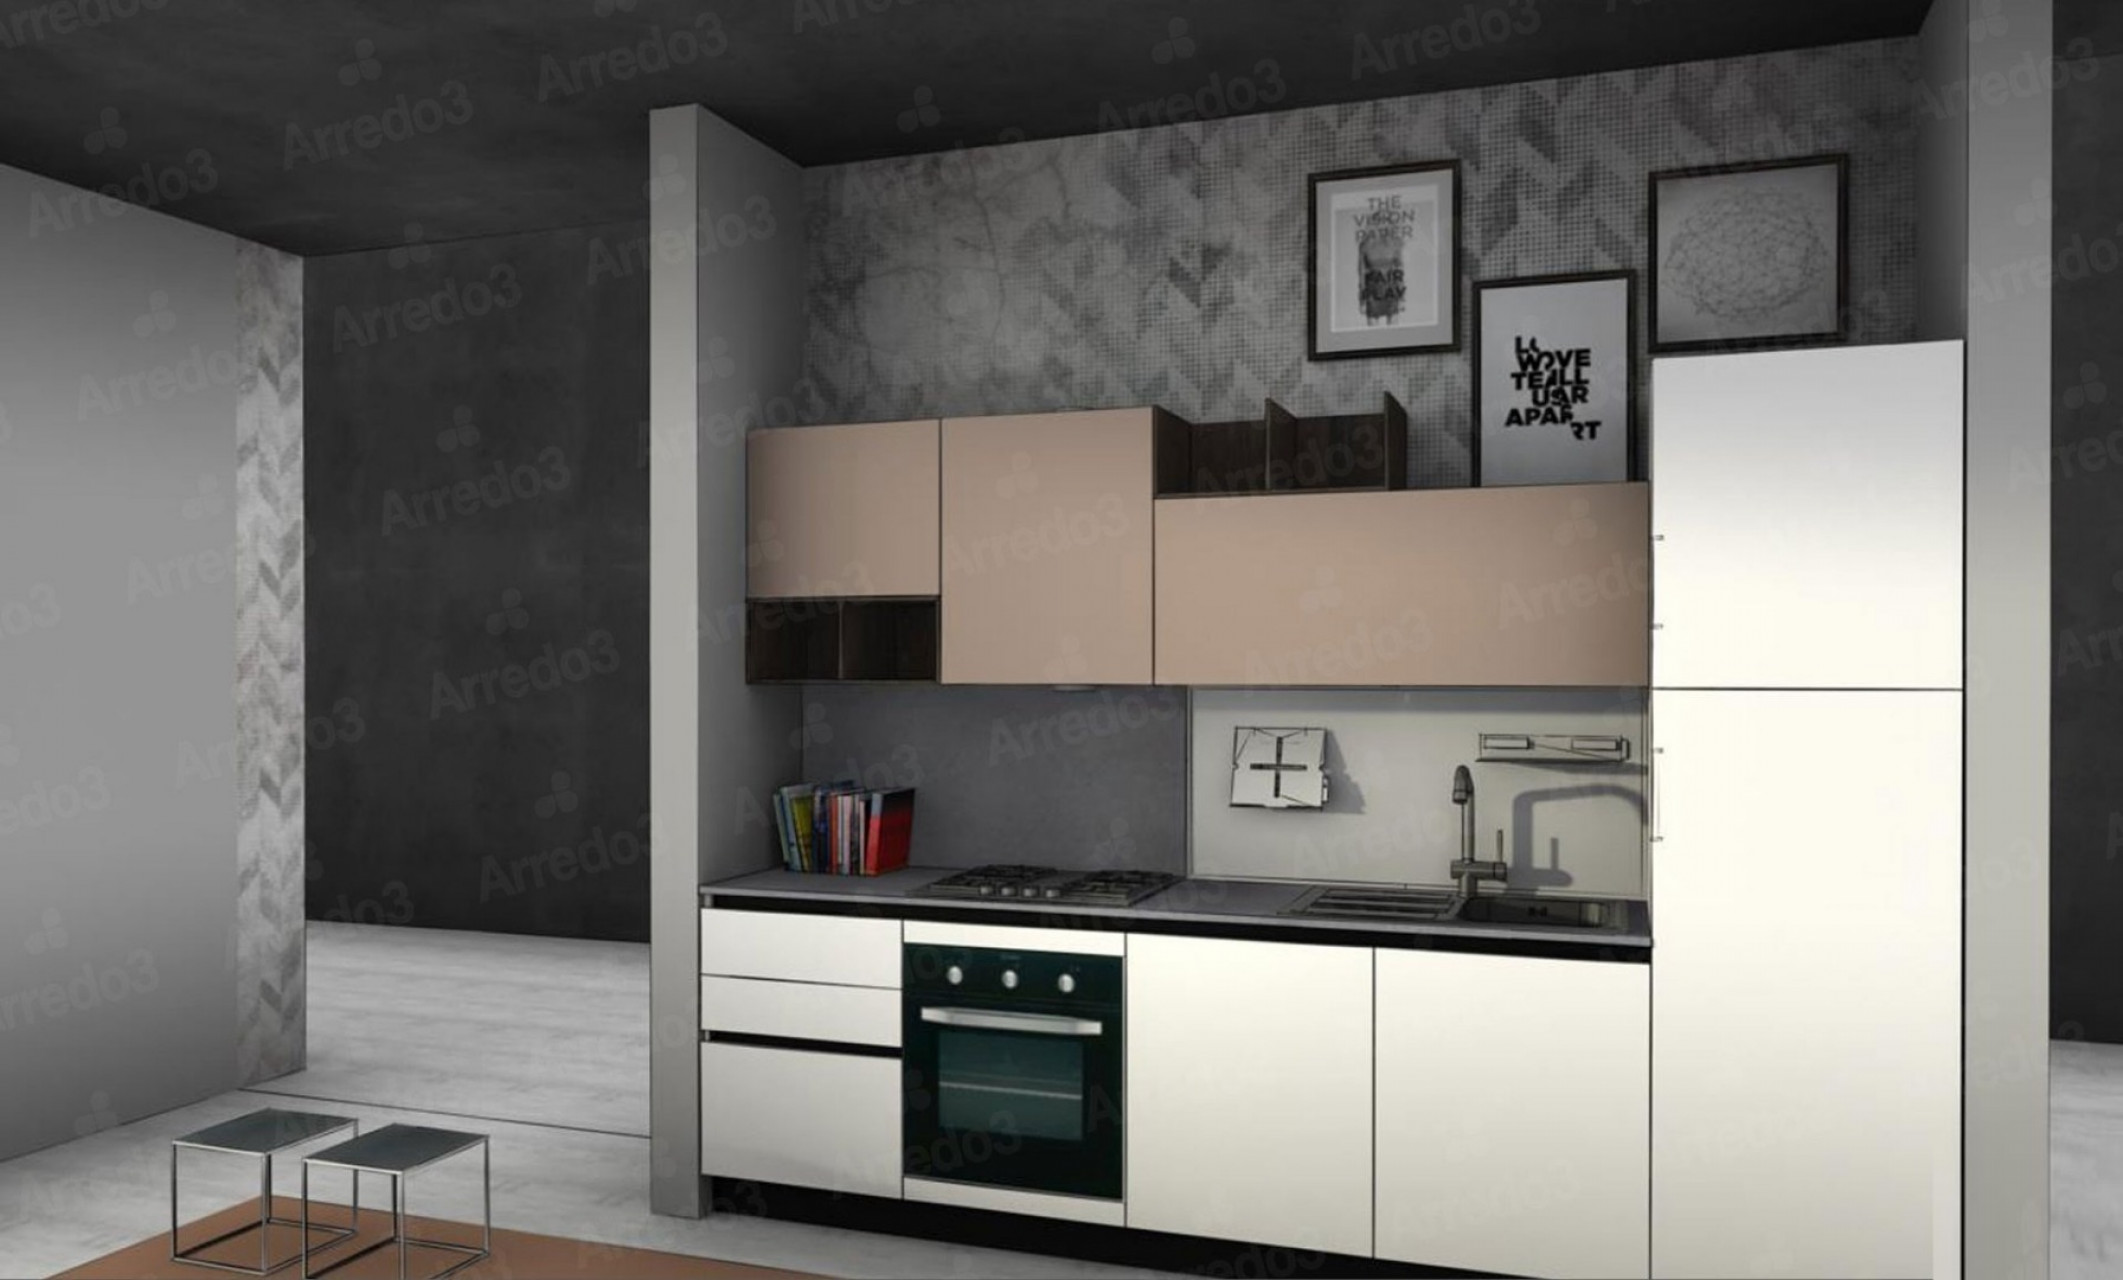 Итальянская Кухня CLOE LM27   Цена на Кухня CLOE LM27 ARREDO3